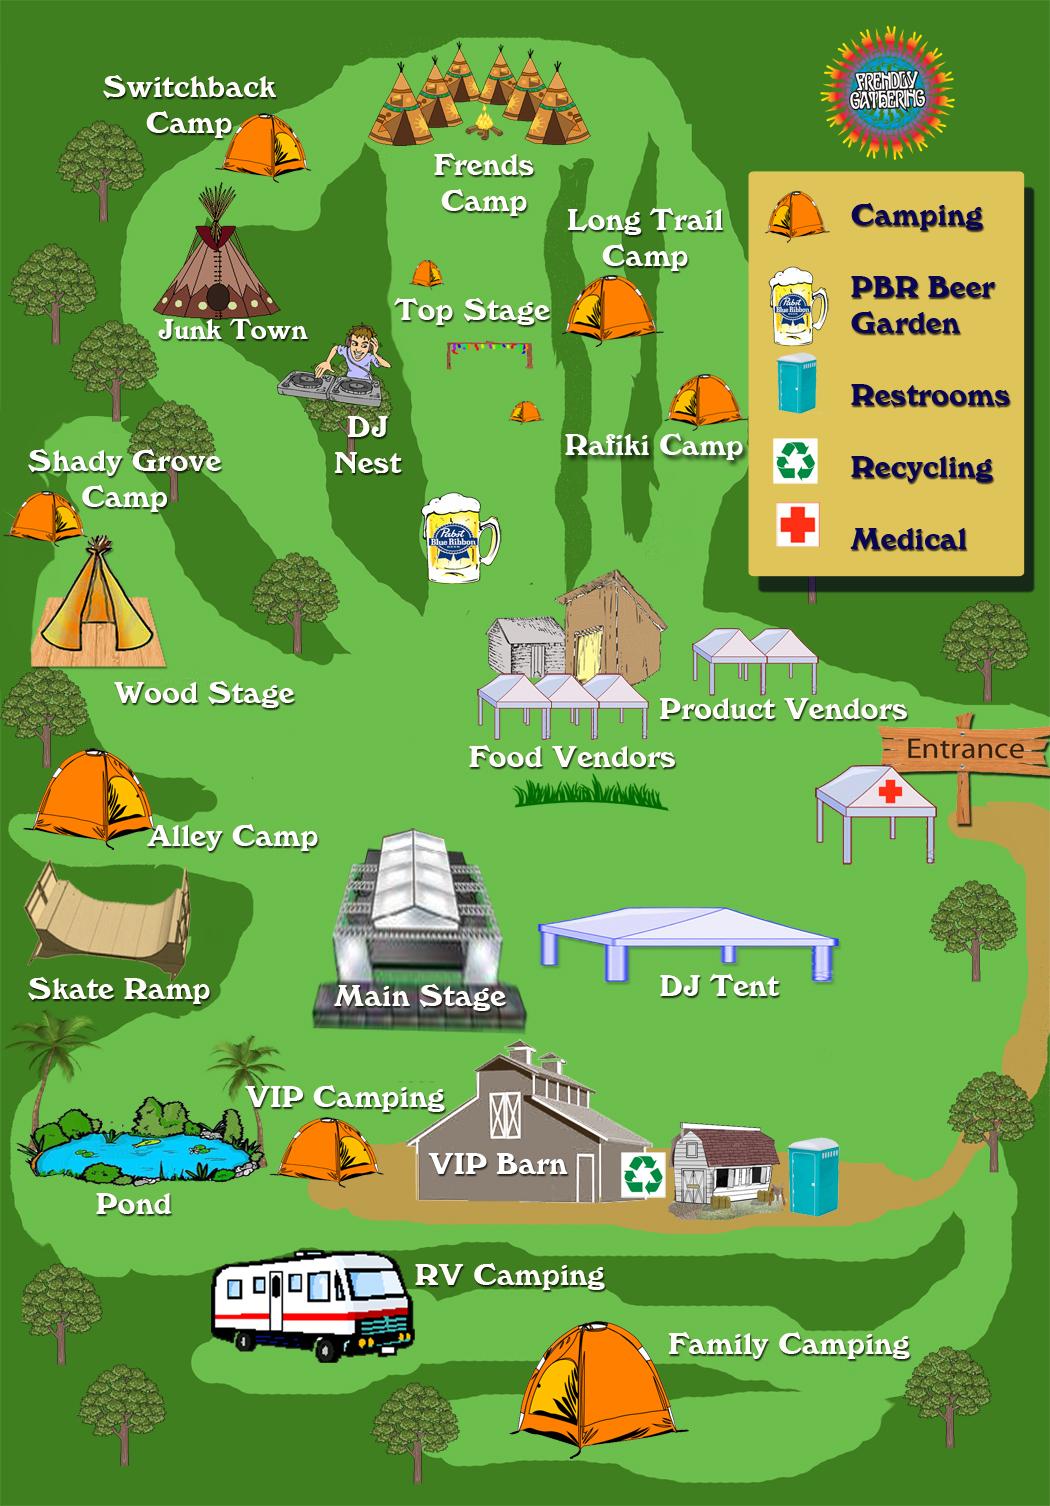 Frendly G Map.jpg